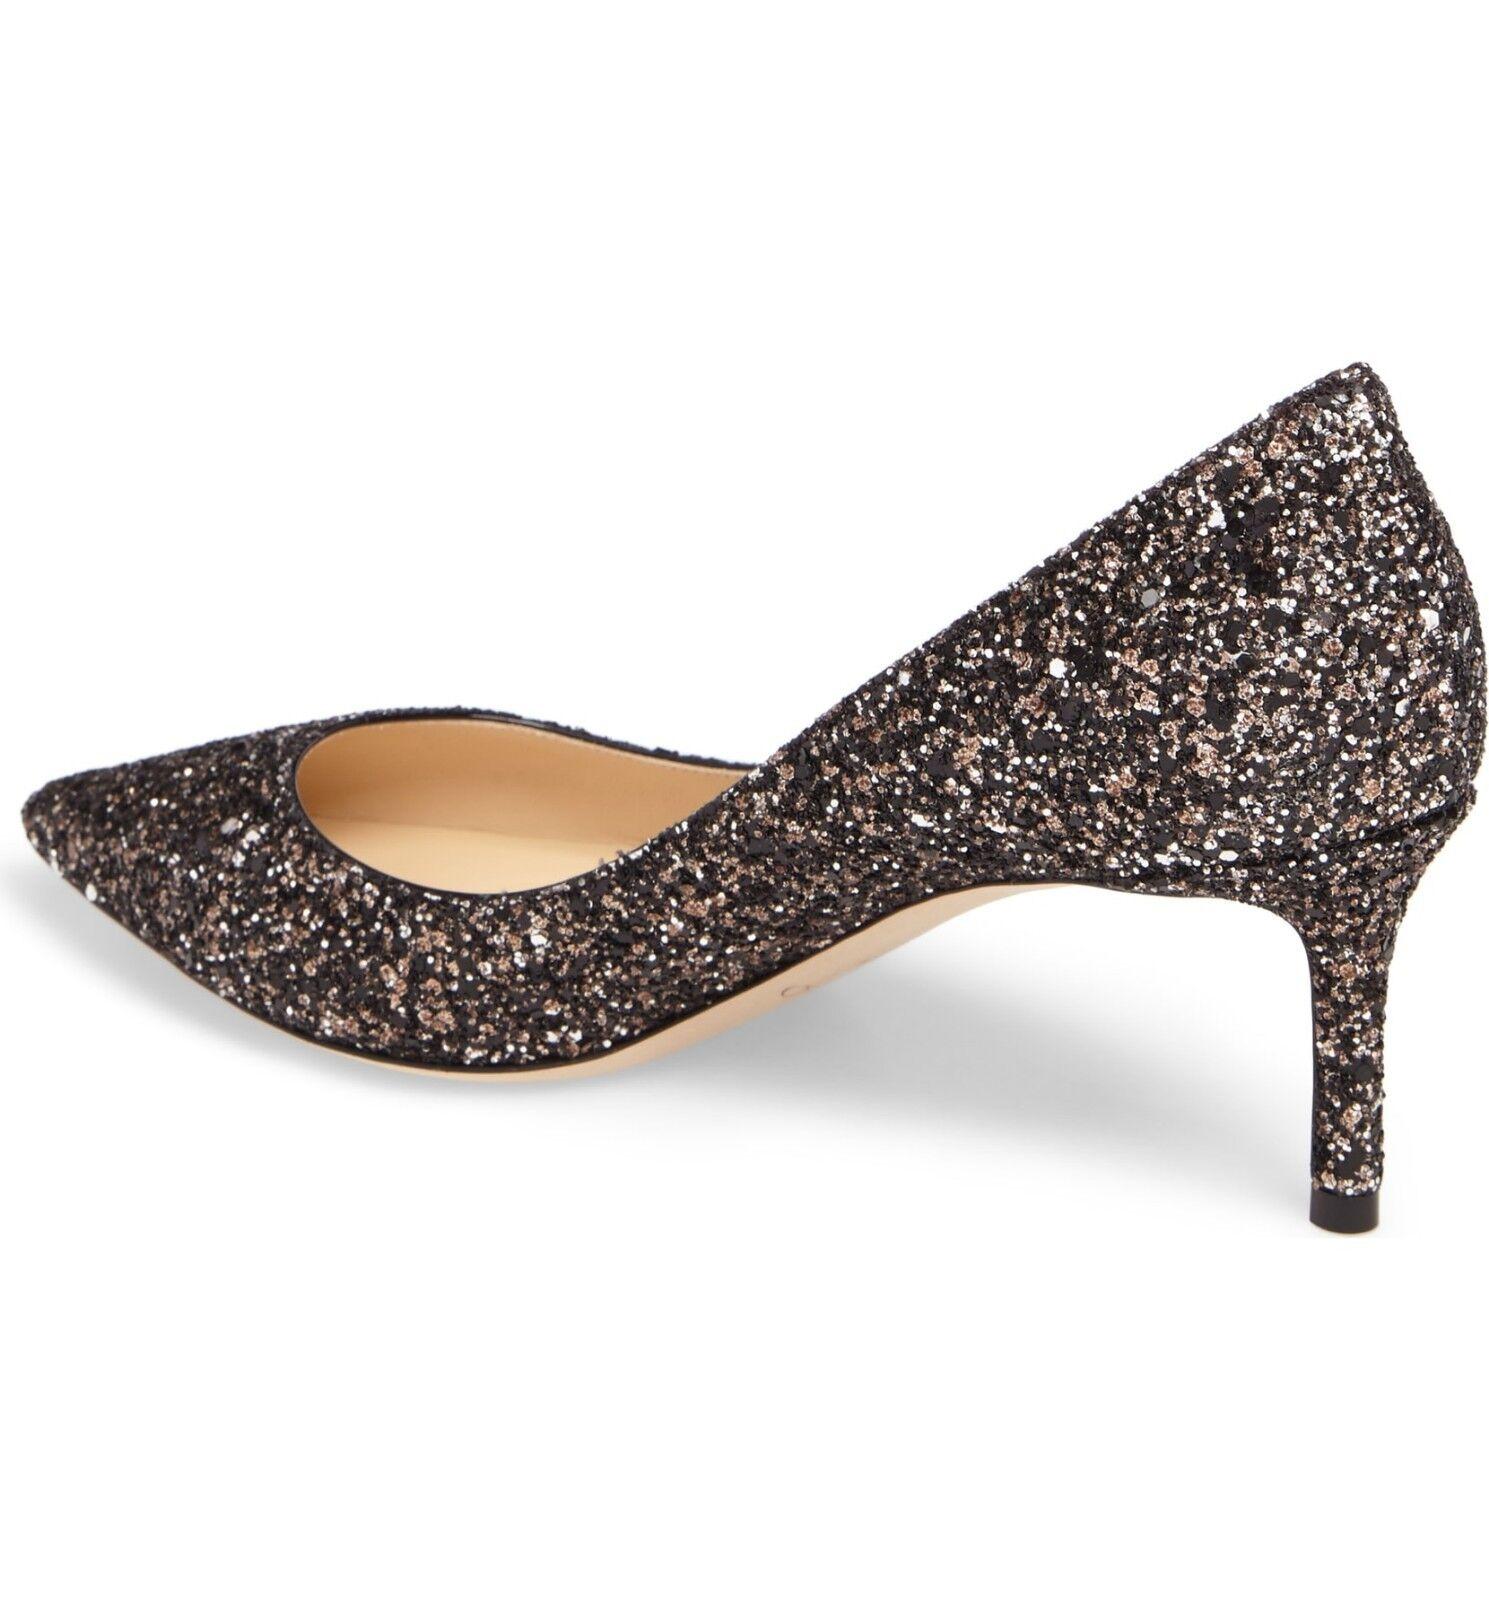 NIB Jimmy Choo ROMY Pointy Toe Pump Heel Heel Heel shoes Crackly Glitter Mix Bronze 38-7.5 738ca4